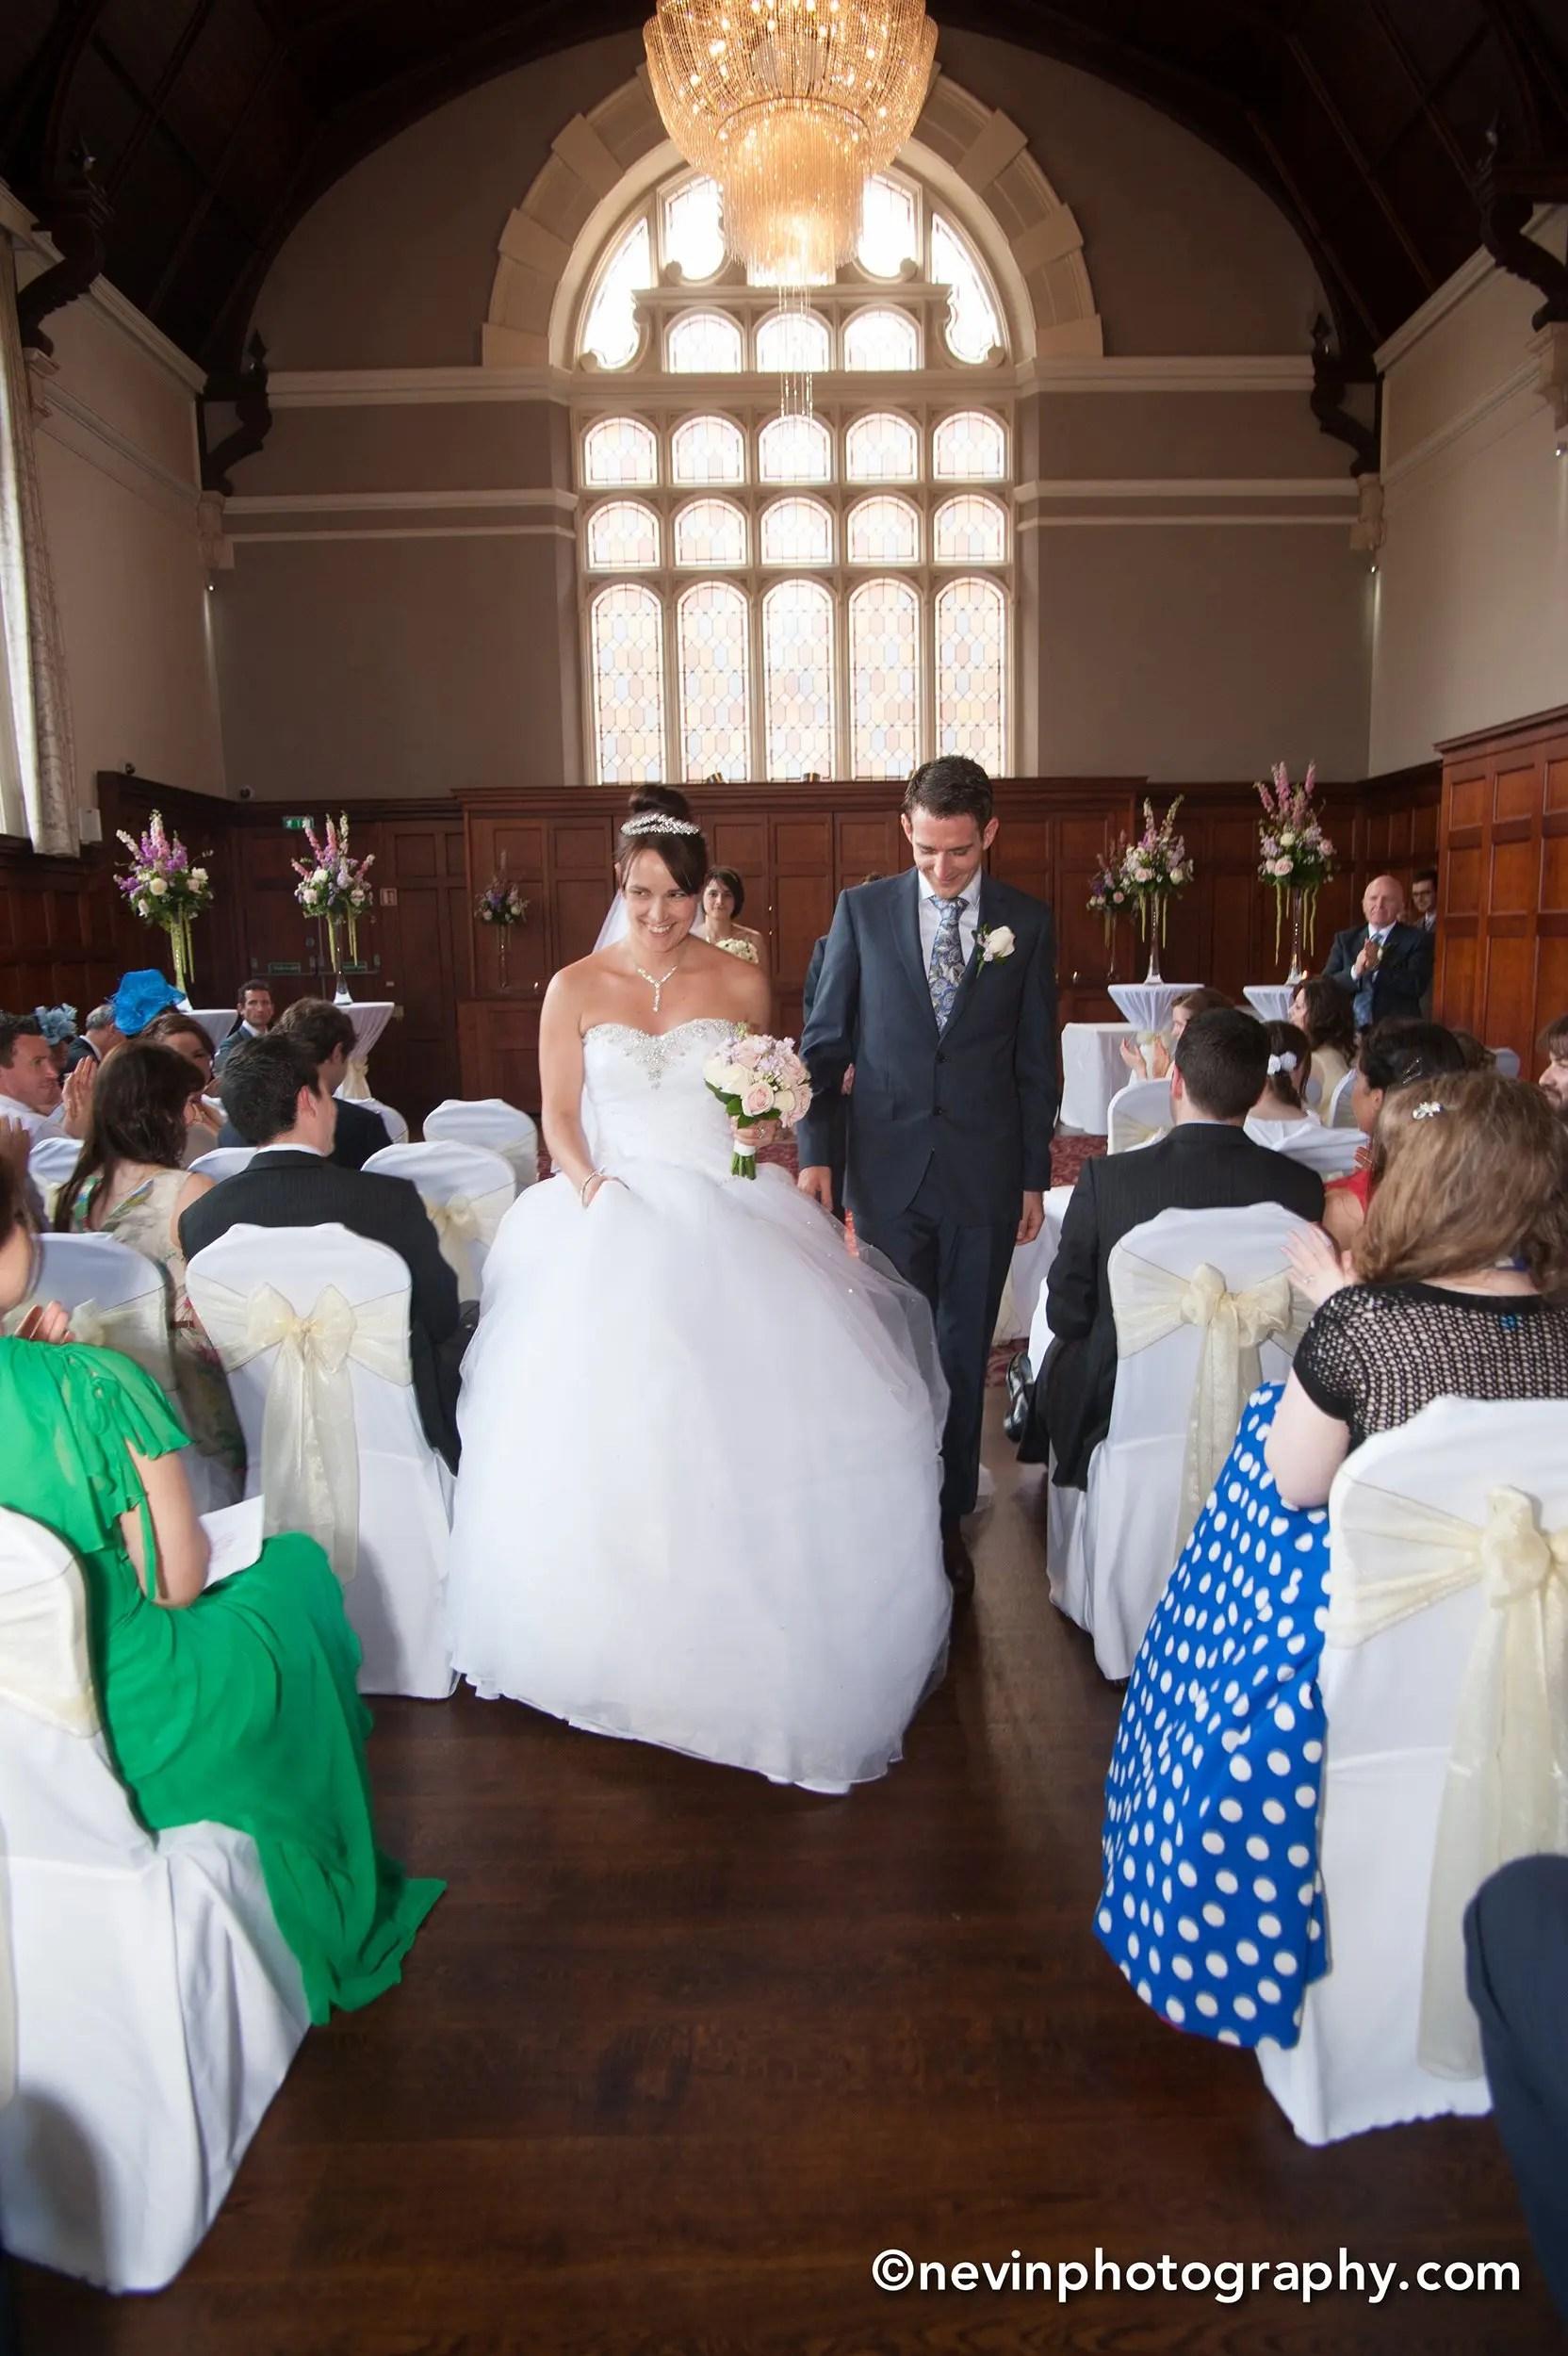 Just married aisle walk at Thomas Prior Hall